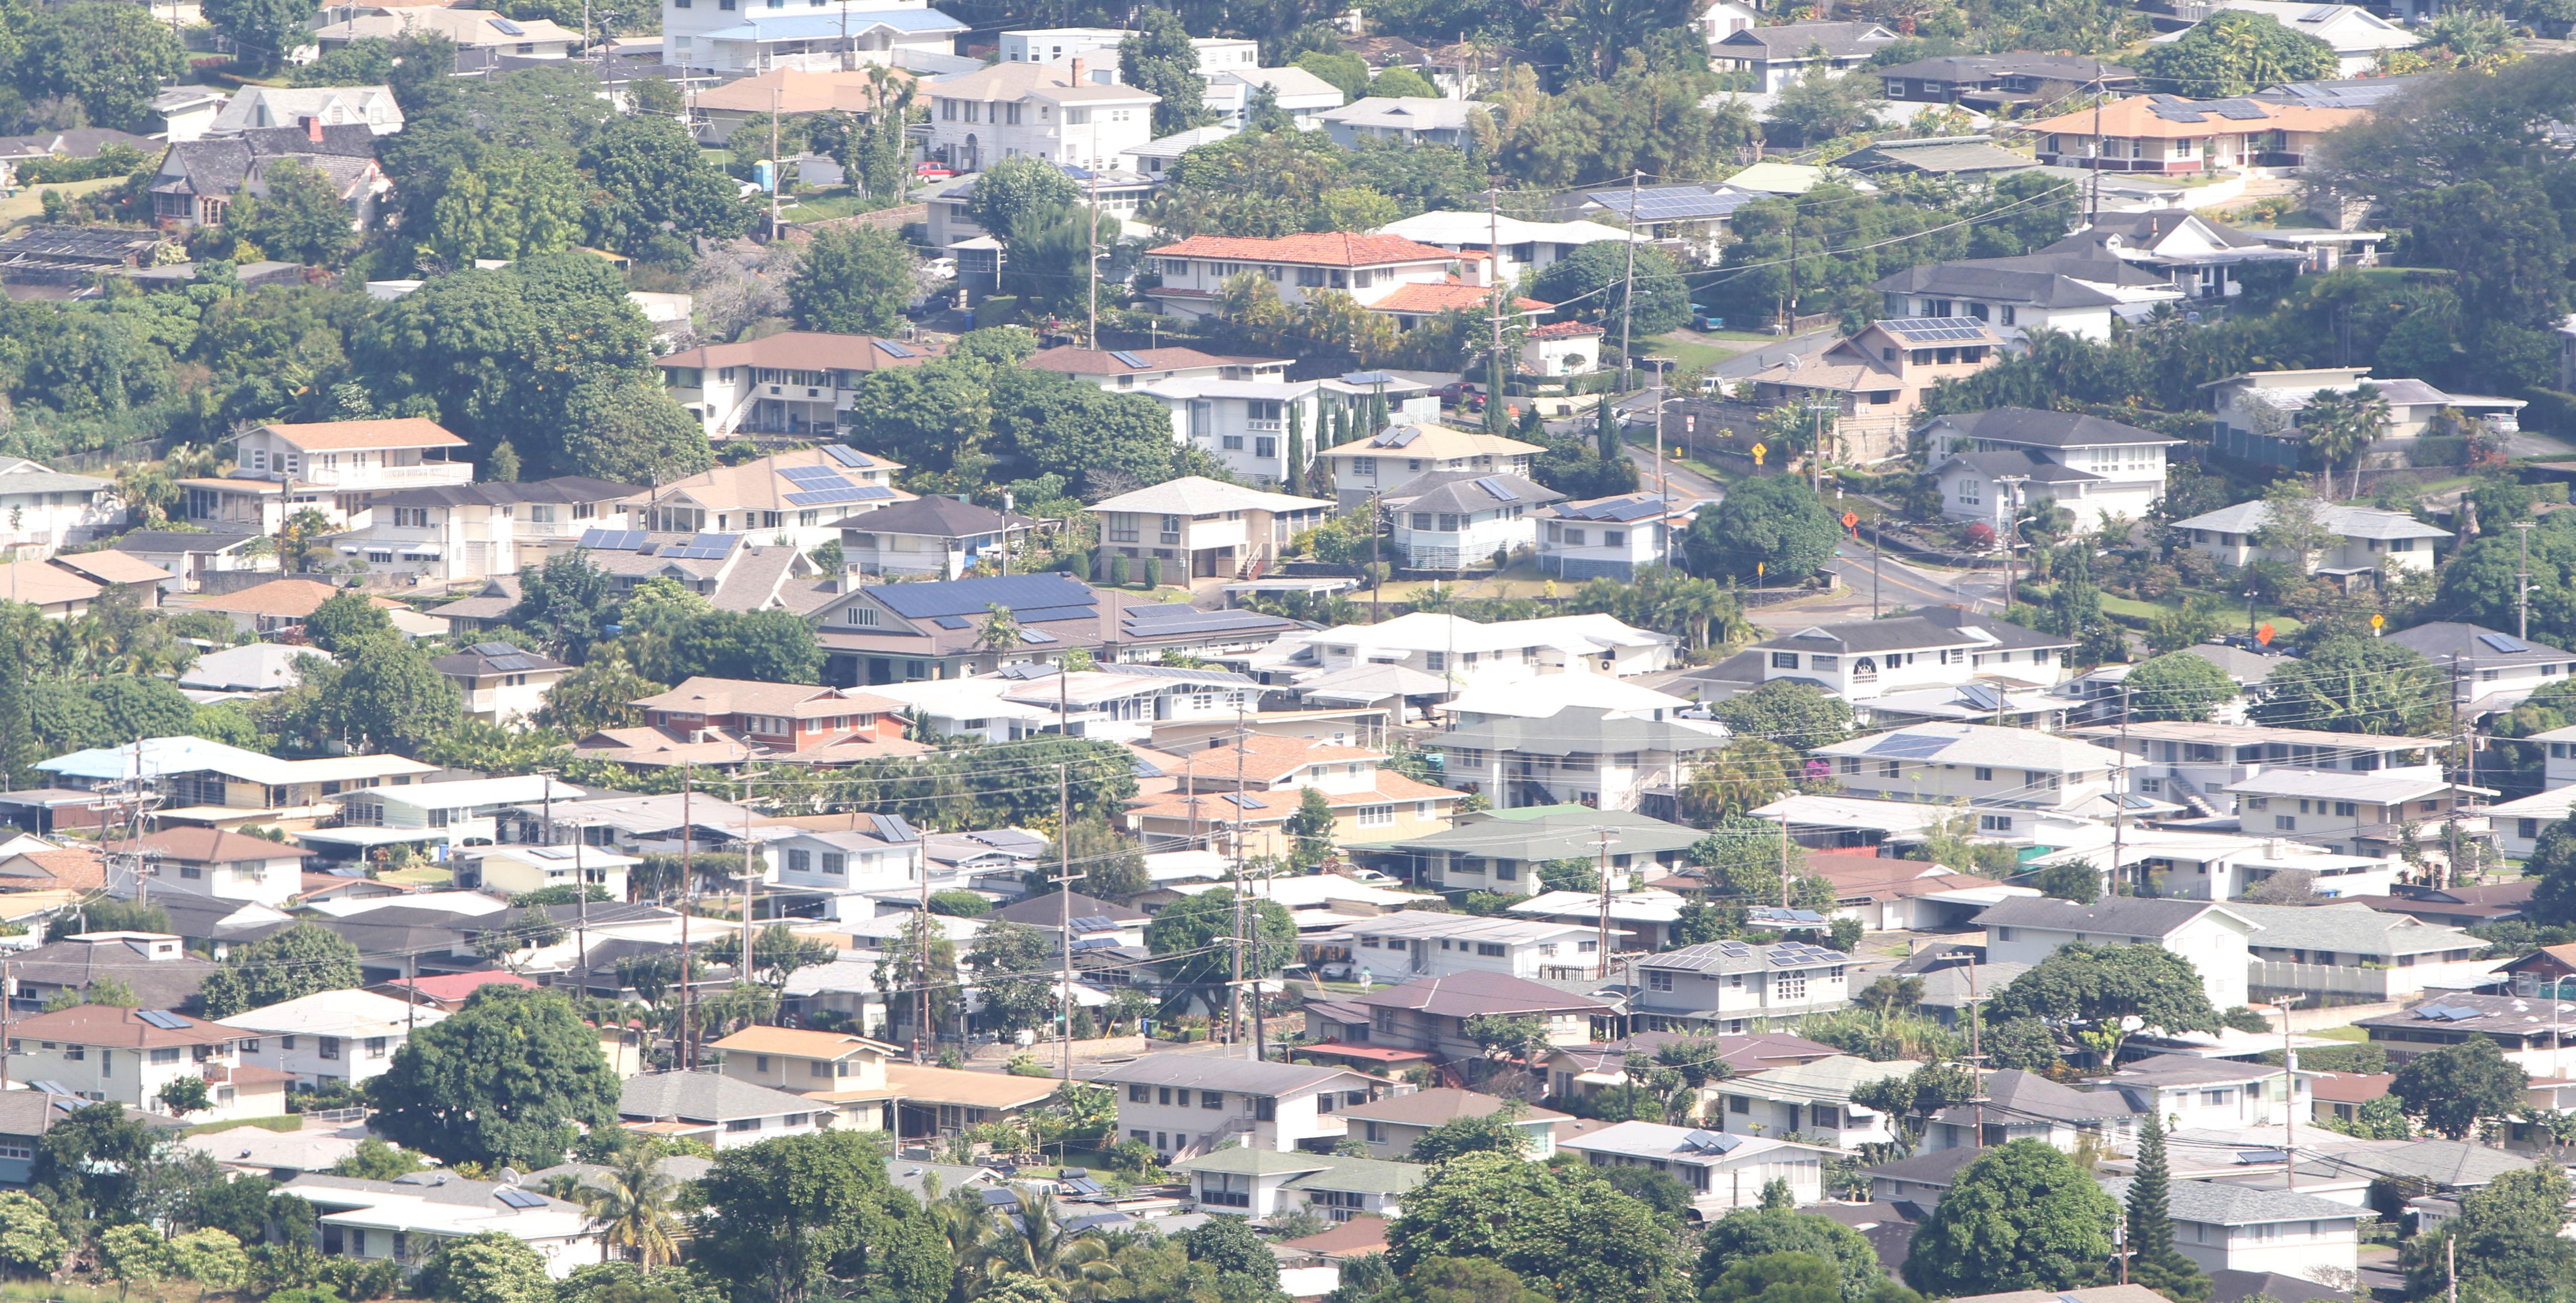 View of upper Manoa homes. 9 dec 2014. photograph Cory Lum